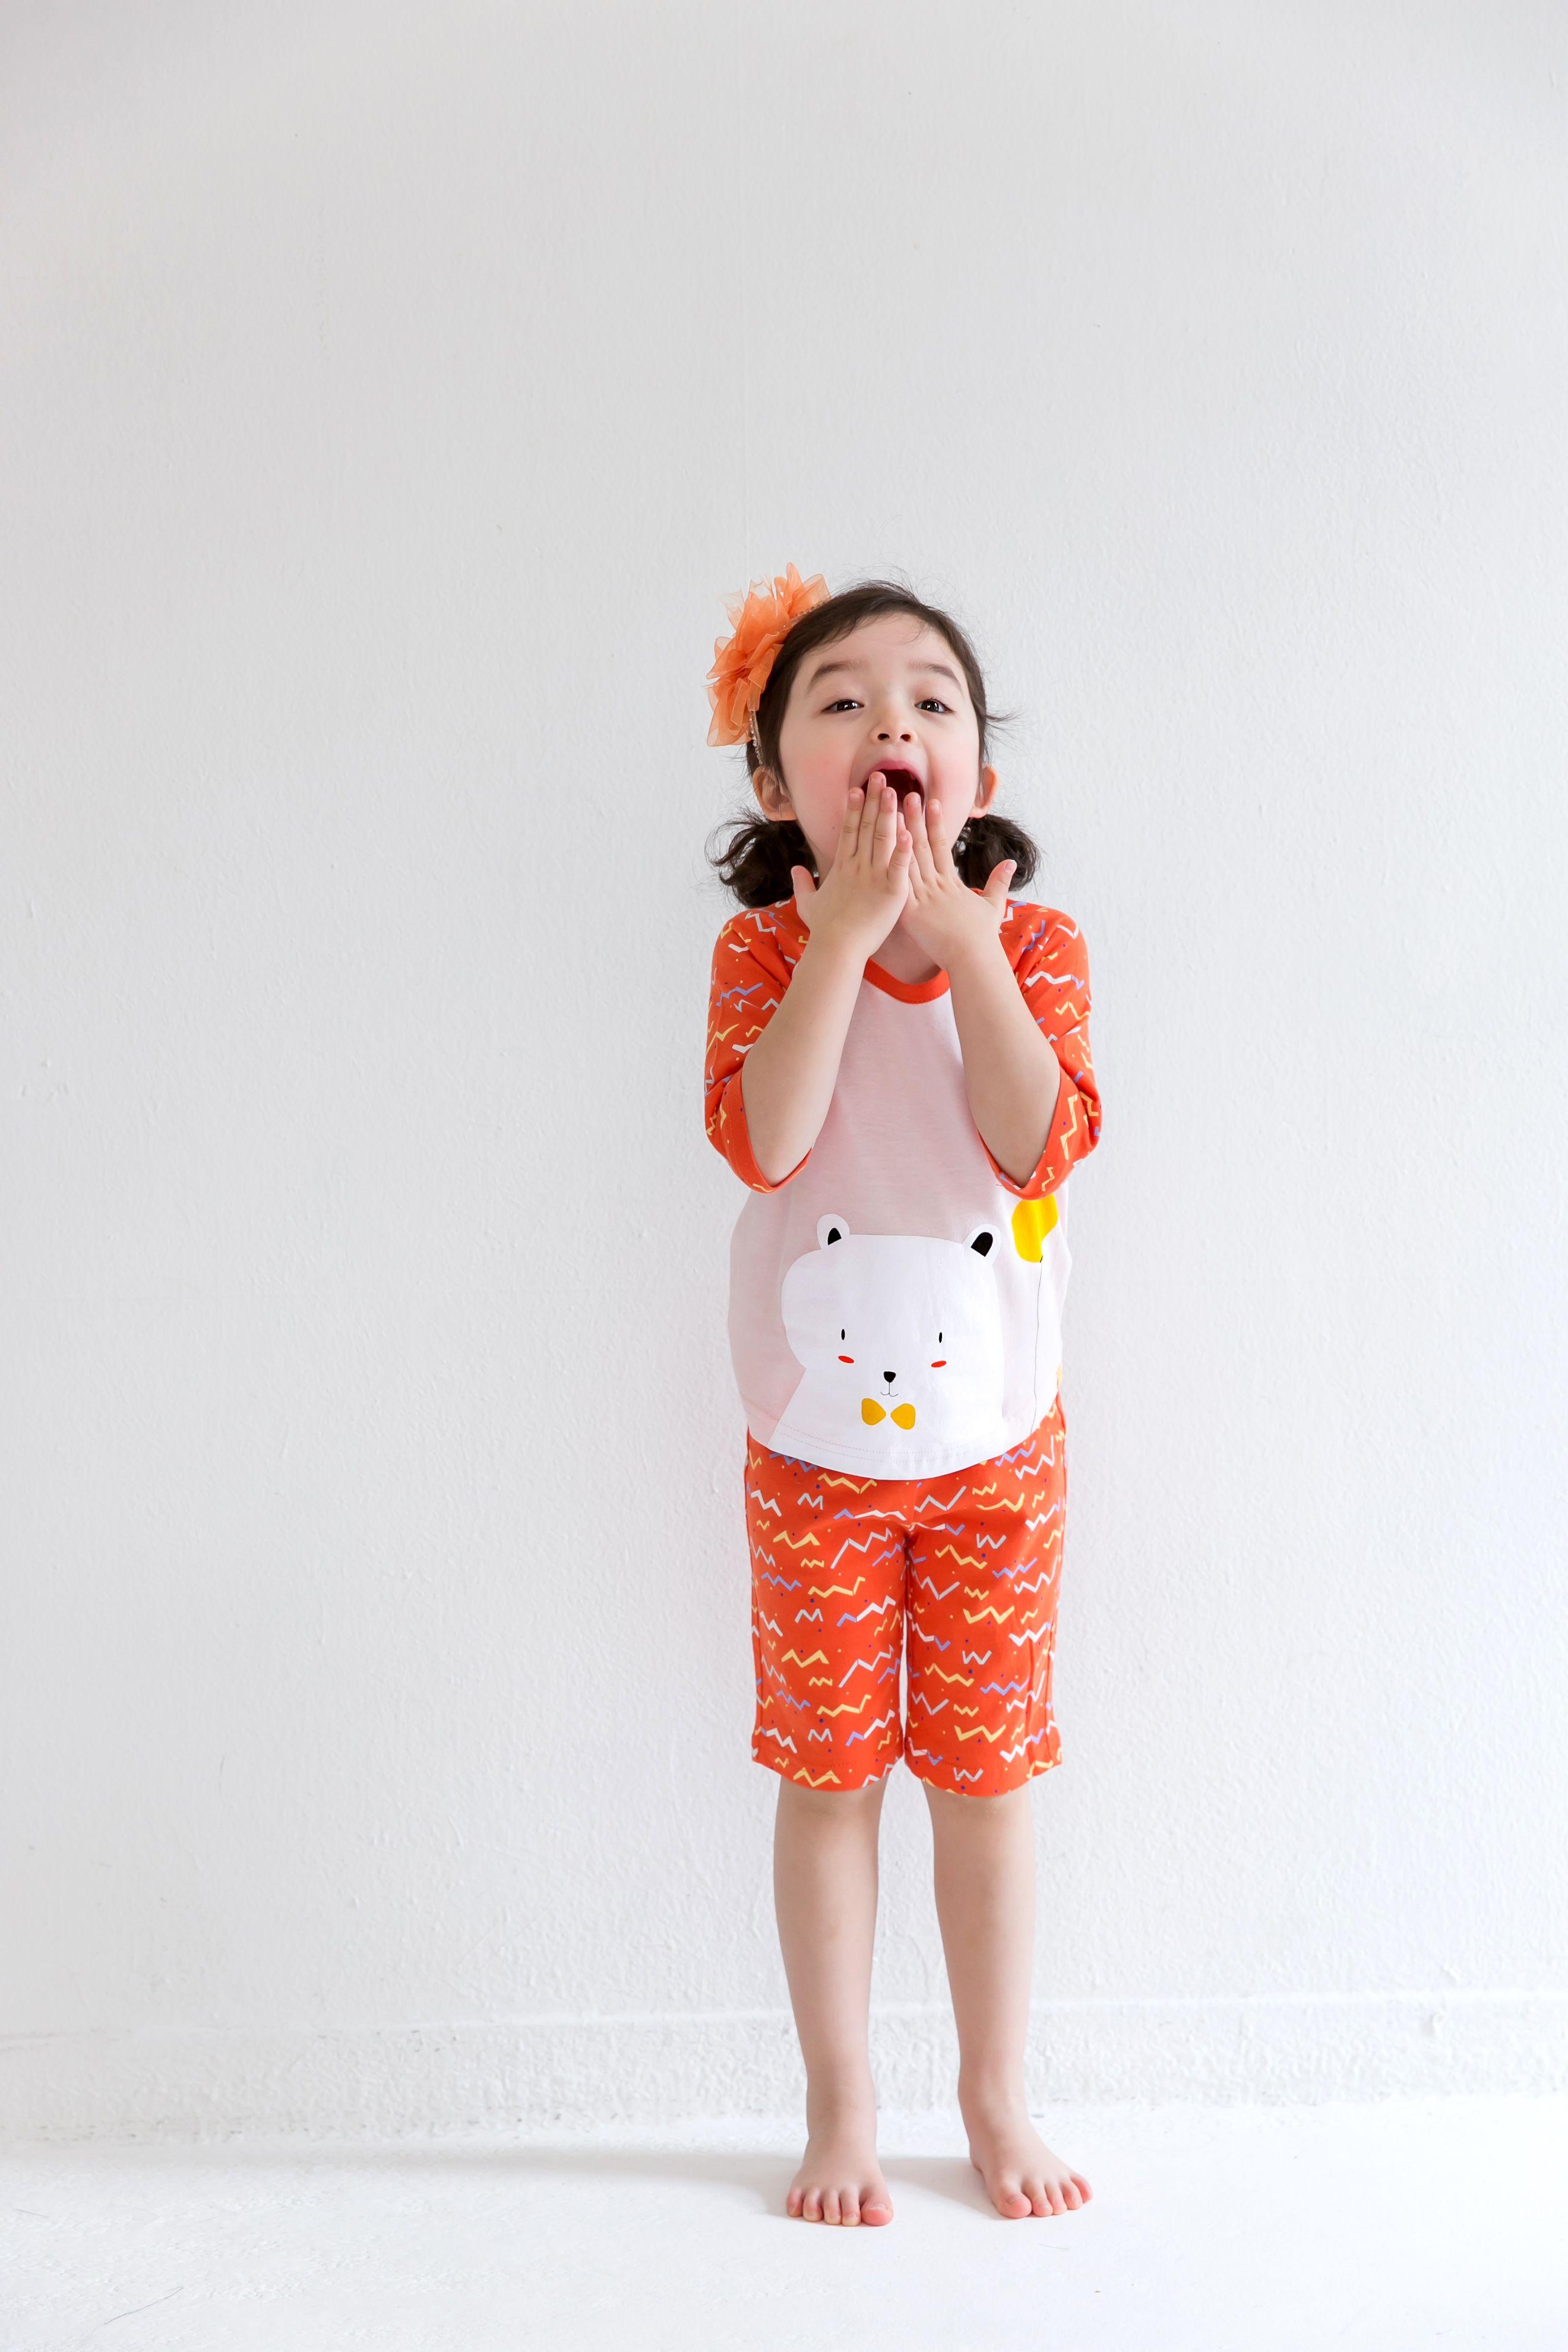 8a765b8f5171 Vaenait Baby Kids Girls Short Sleeve Sleepwear Pajama